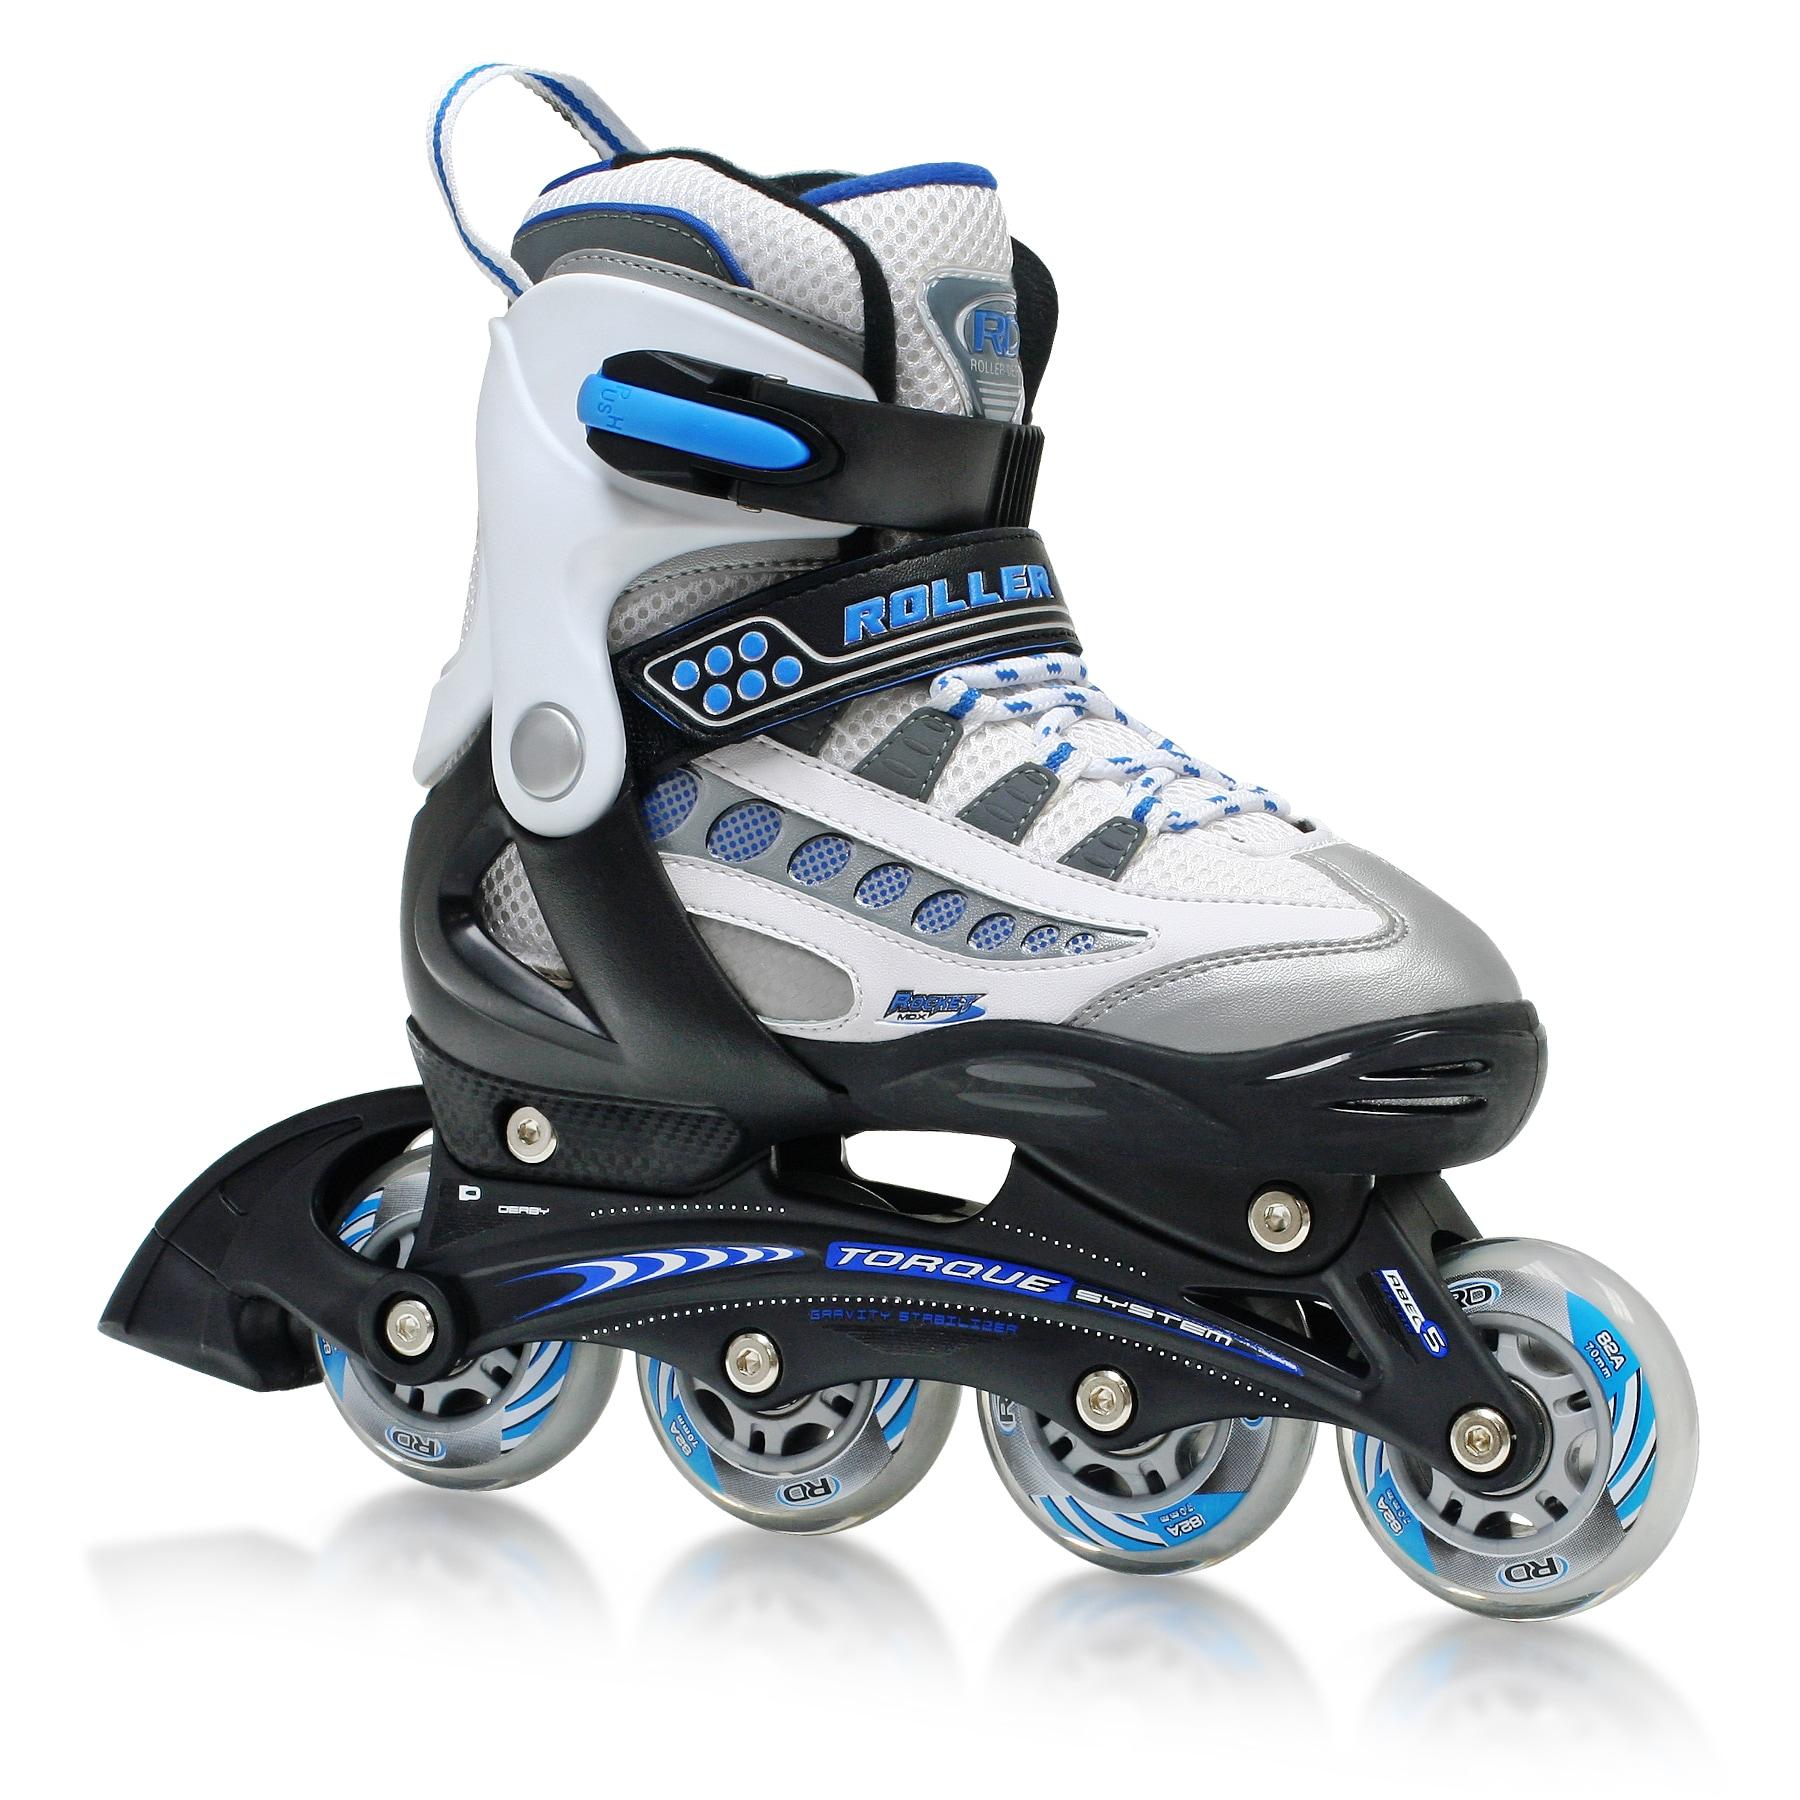 Rocket MDX Boy's Adjustable Inline Skates